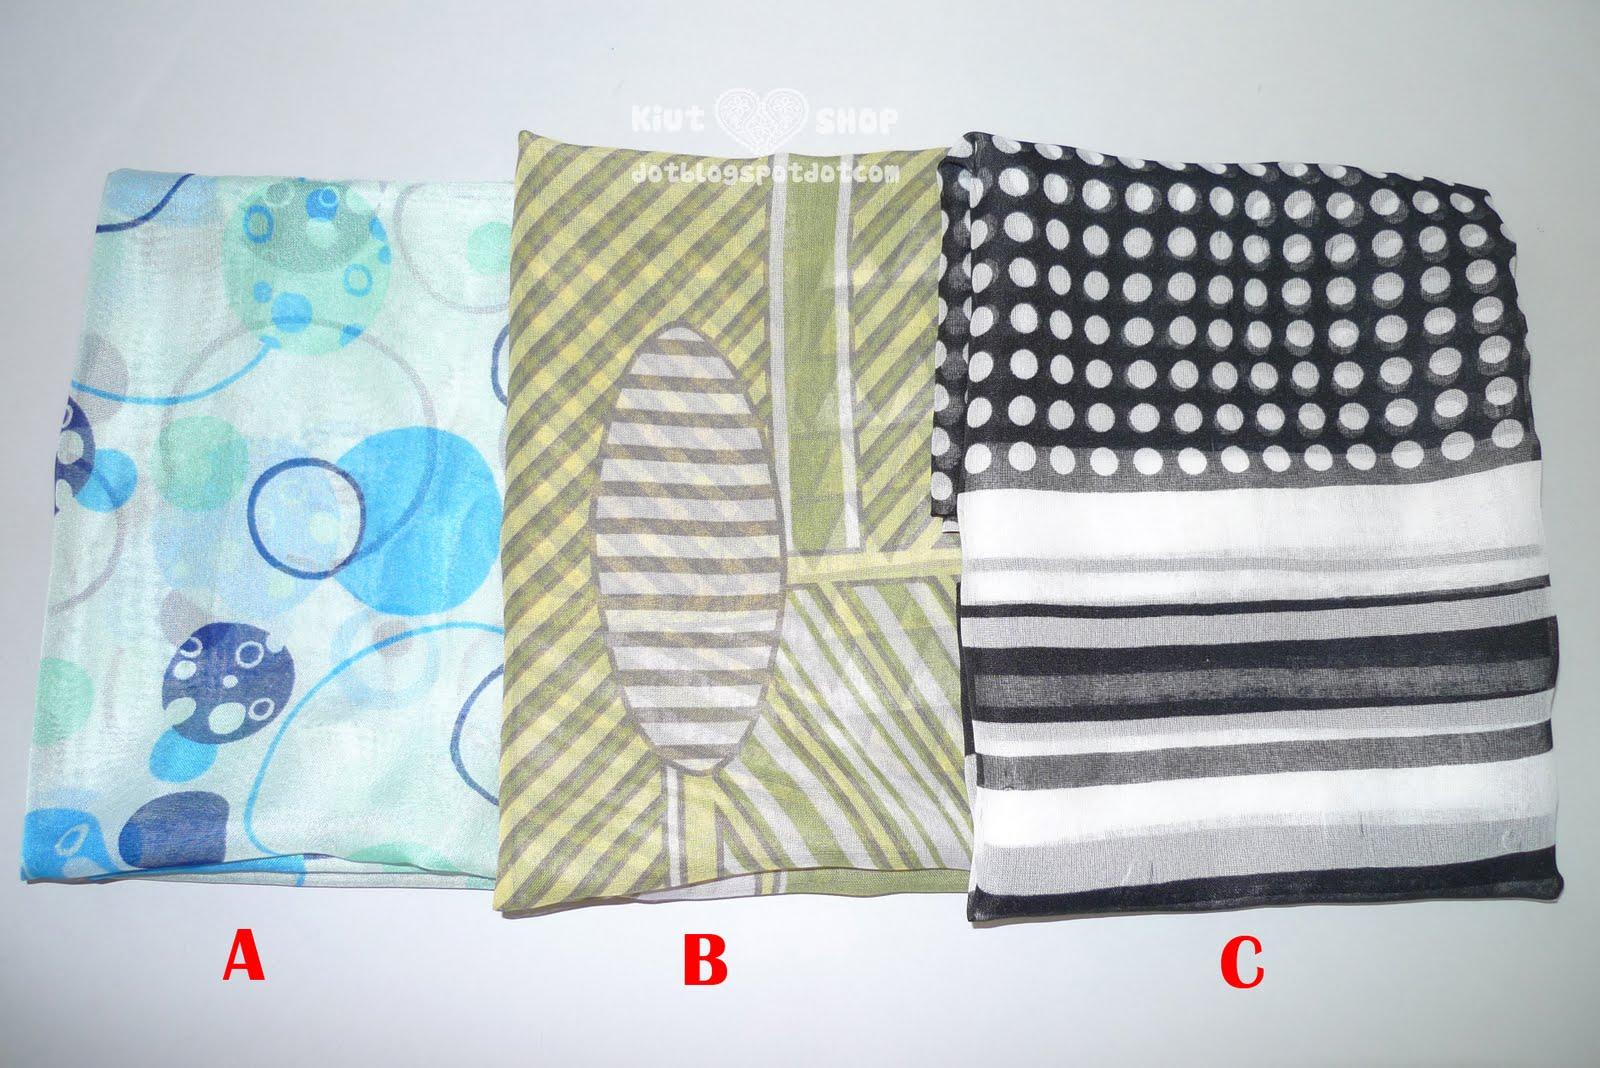 http://4.bp.blogspot.com/_DLALrAbhcZ4/TRlH4I-4pLI/AAAAAAAAB8g/cwLyiIPm9PE/s1600/Tie%2BRack%2BScarves.jpg